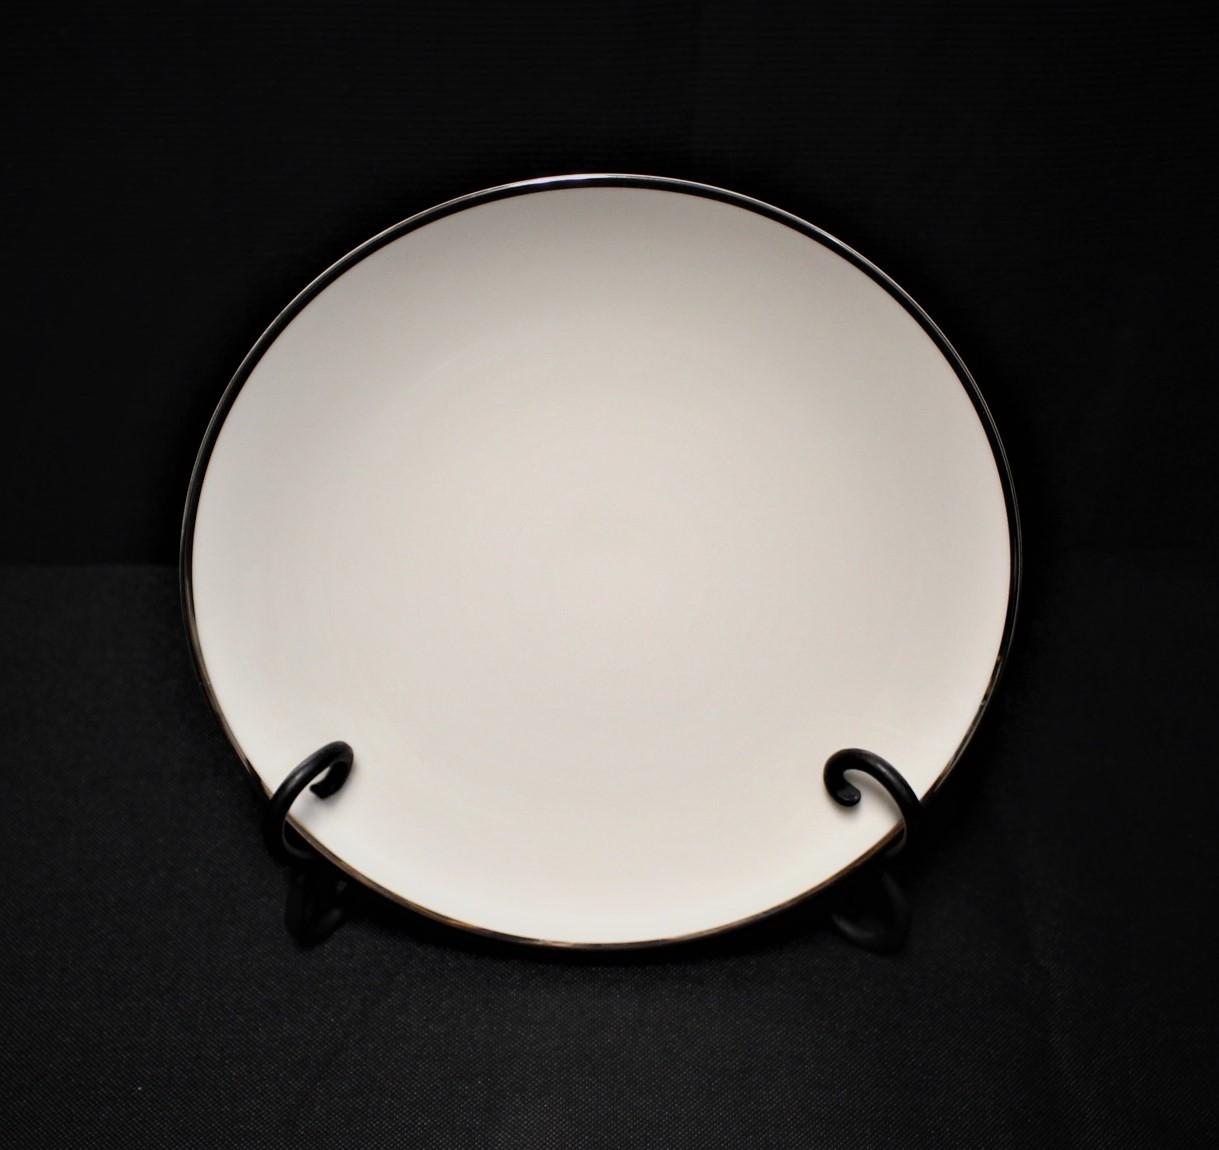 "Noritake Ivonne 7522 Ivory China 8 3/8"" Salad Plate w/ Platinum Trim"